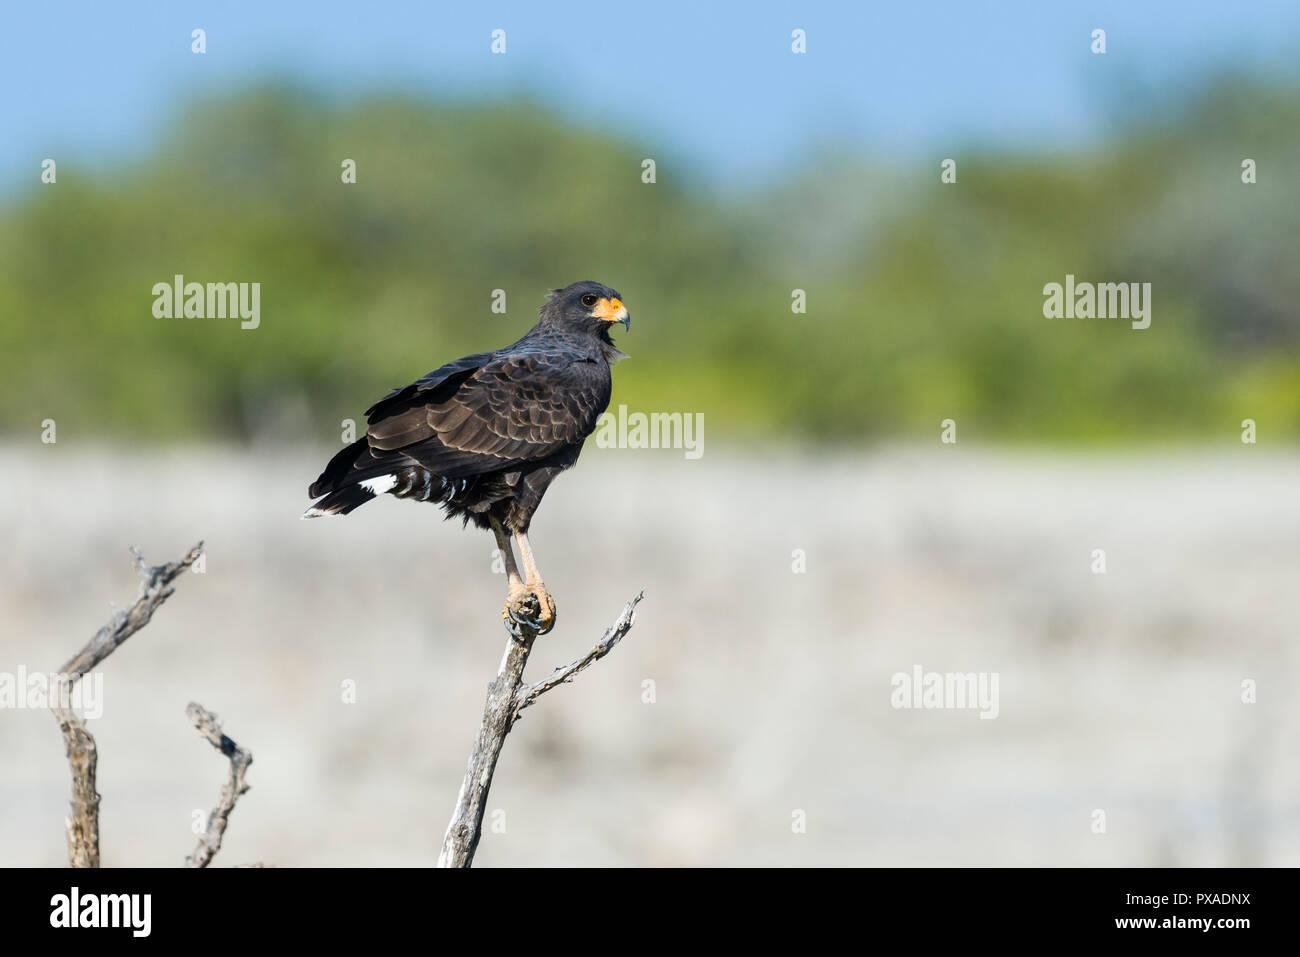 A Cuban Black Hawk (Buteogallus gundlachii), perched, hunting. Cuba - Stock Image